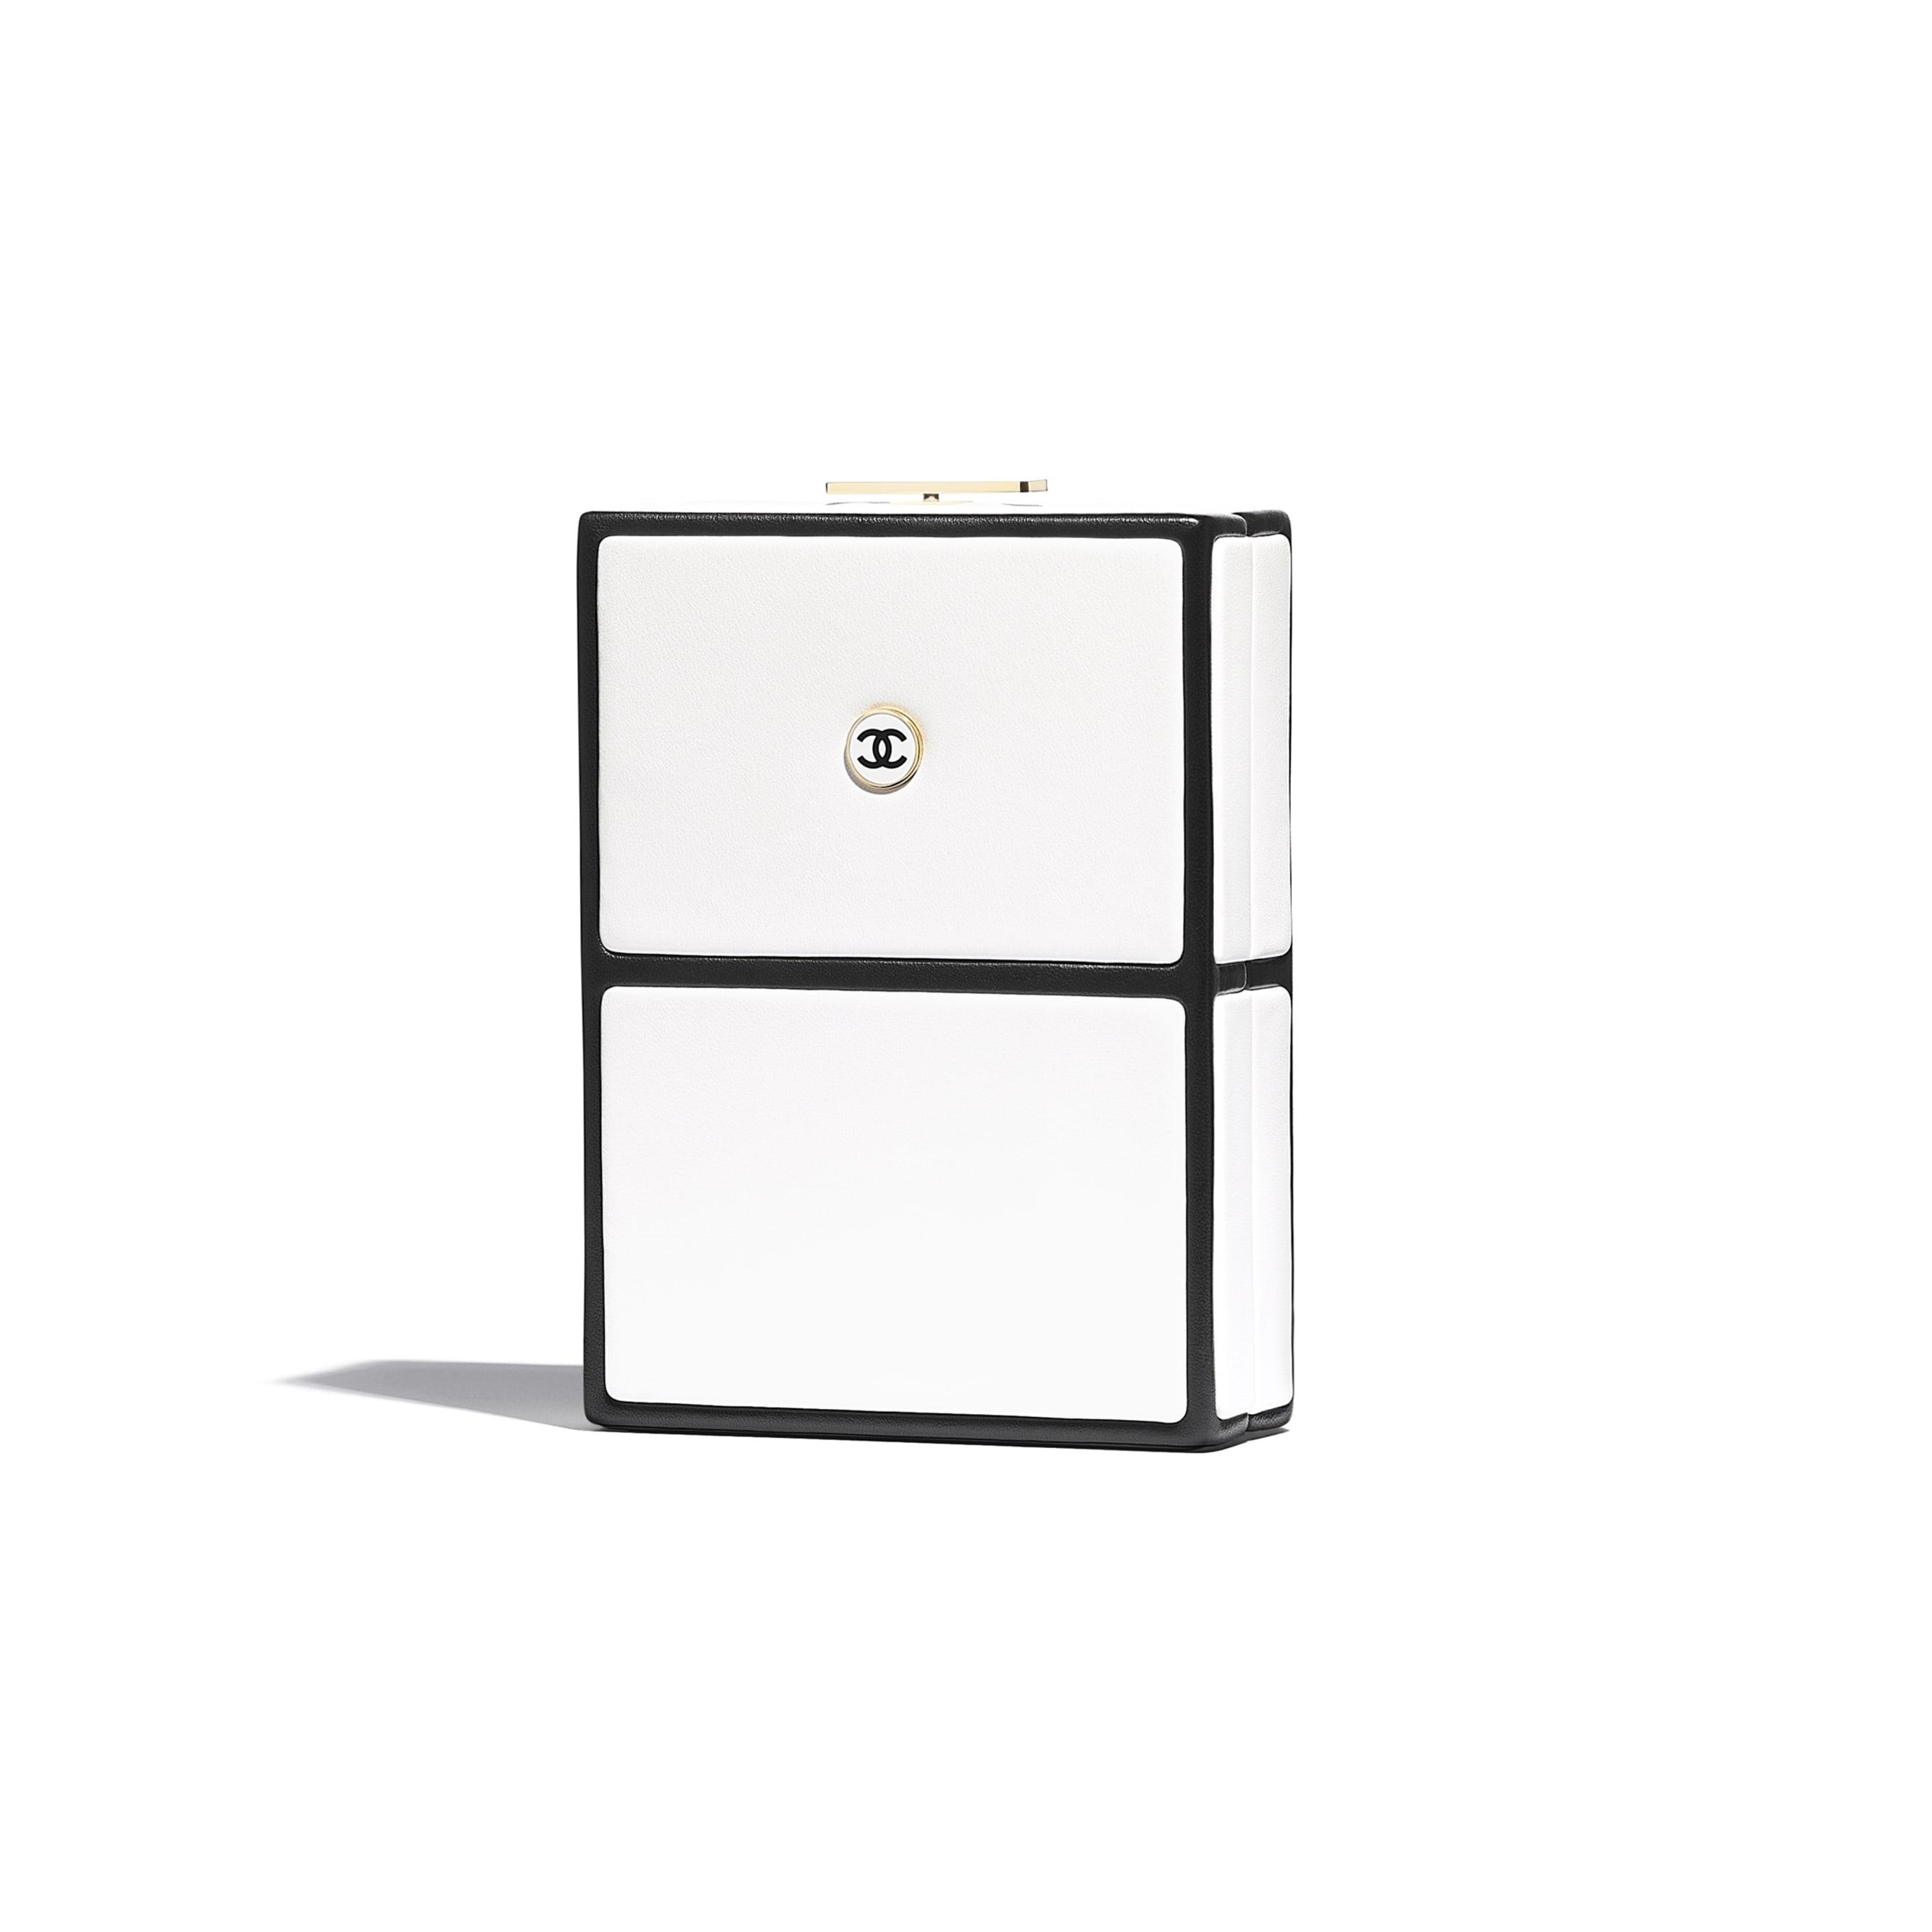 Evening Bag - White & Black - Lambskin - CHANEL - Alternative view - see standard sized version